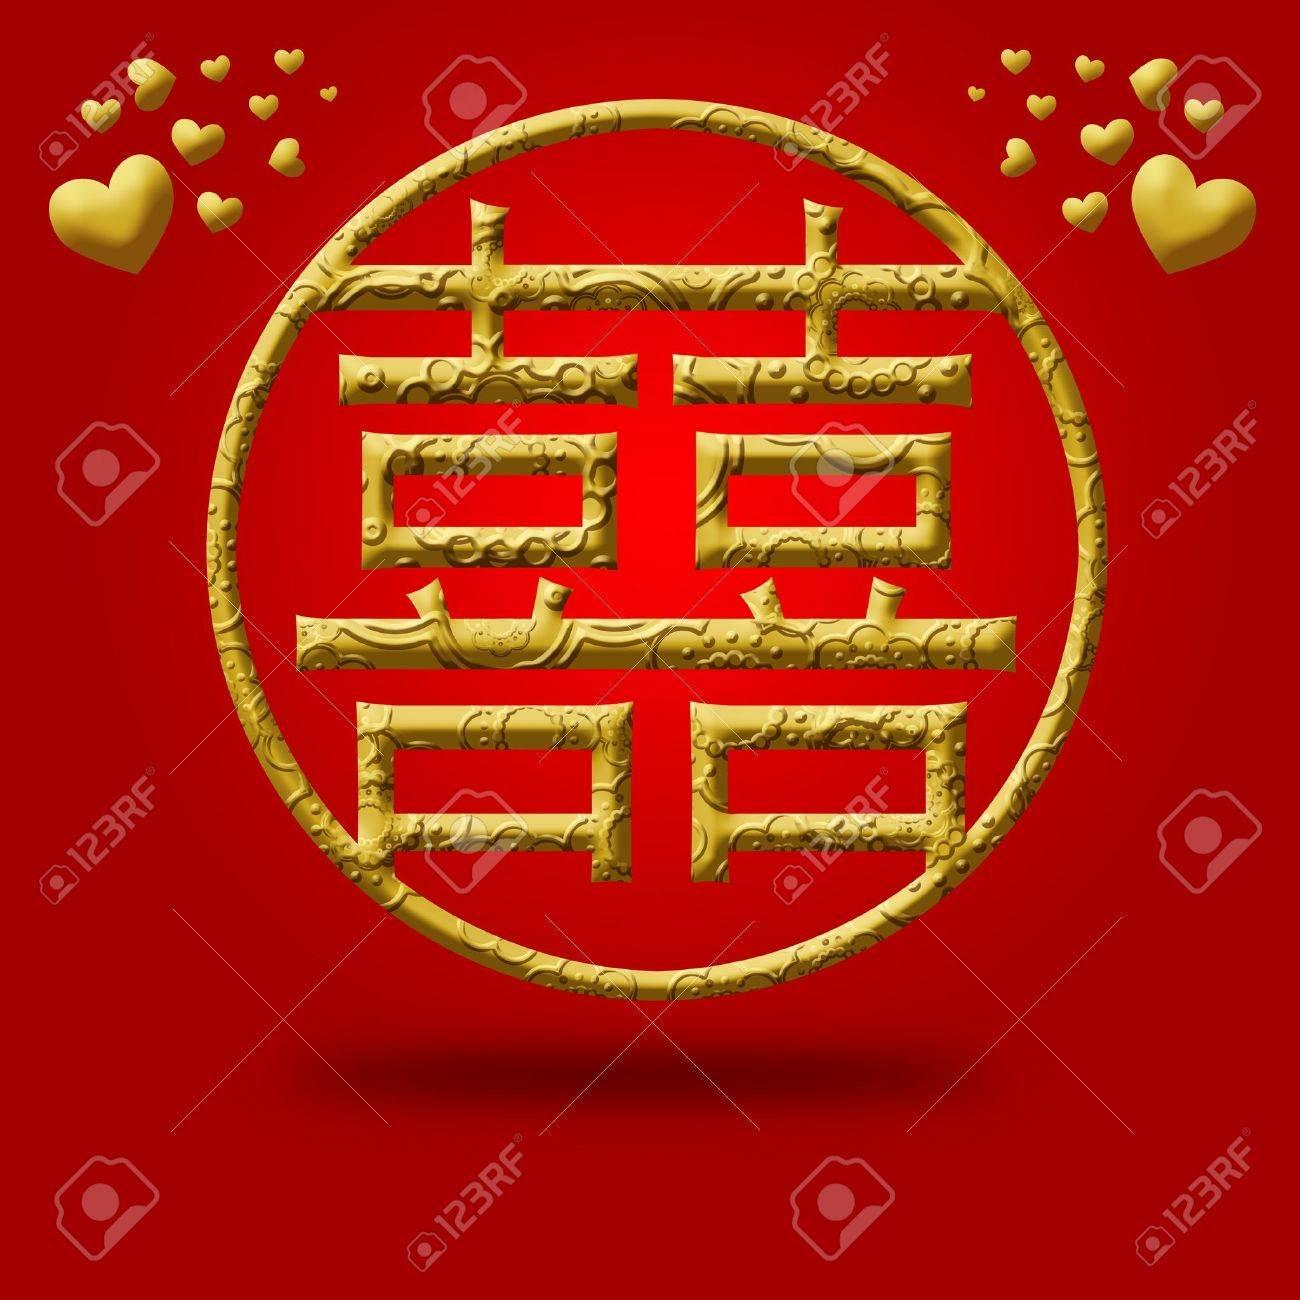 Circle Of Love Double Happiness Chinese Wedding Symbols Illustration